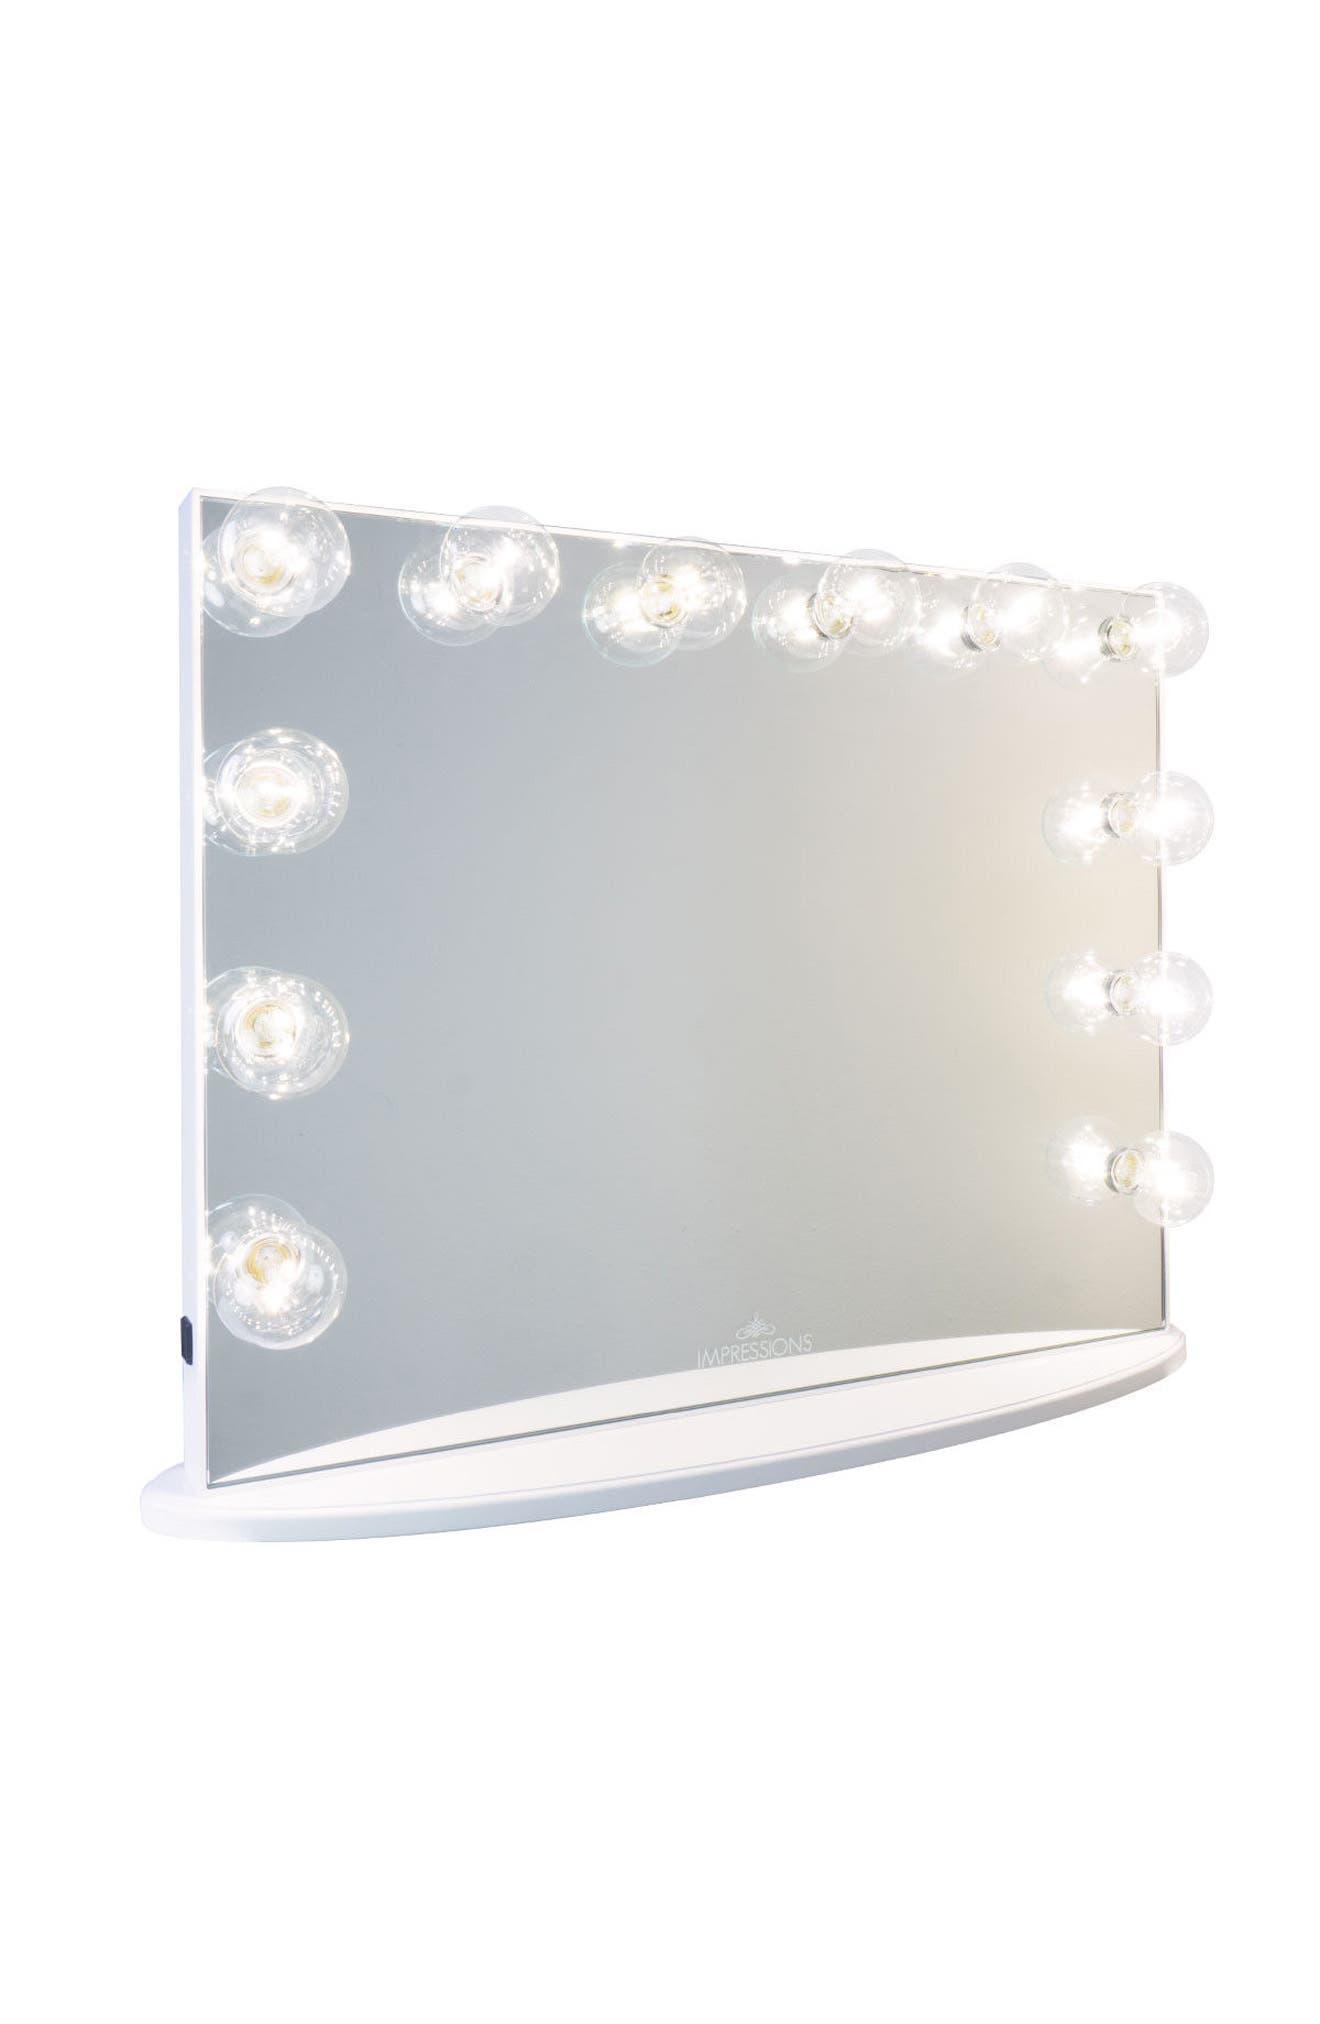 Main Image - Impressions Vanity Co. Hollywood Glow™ Plus Vanity Mirror